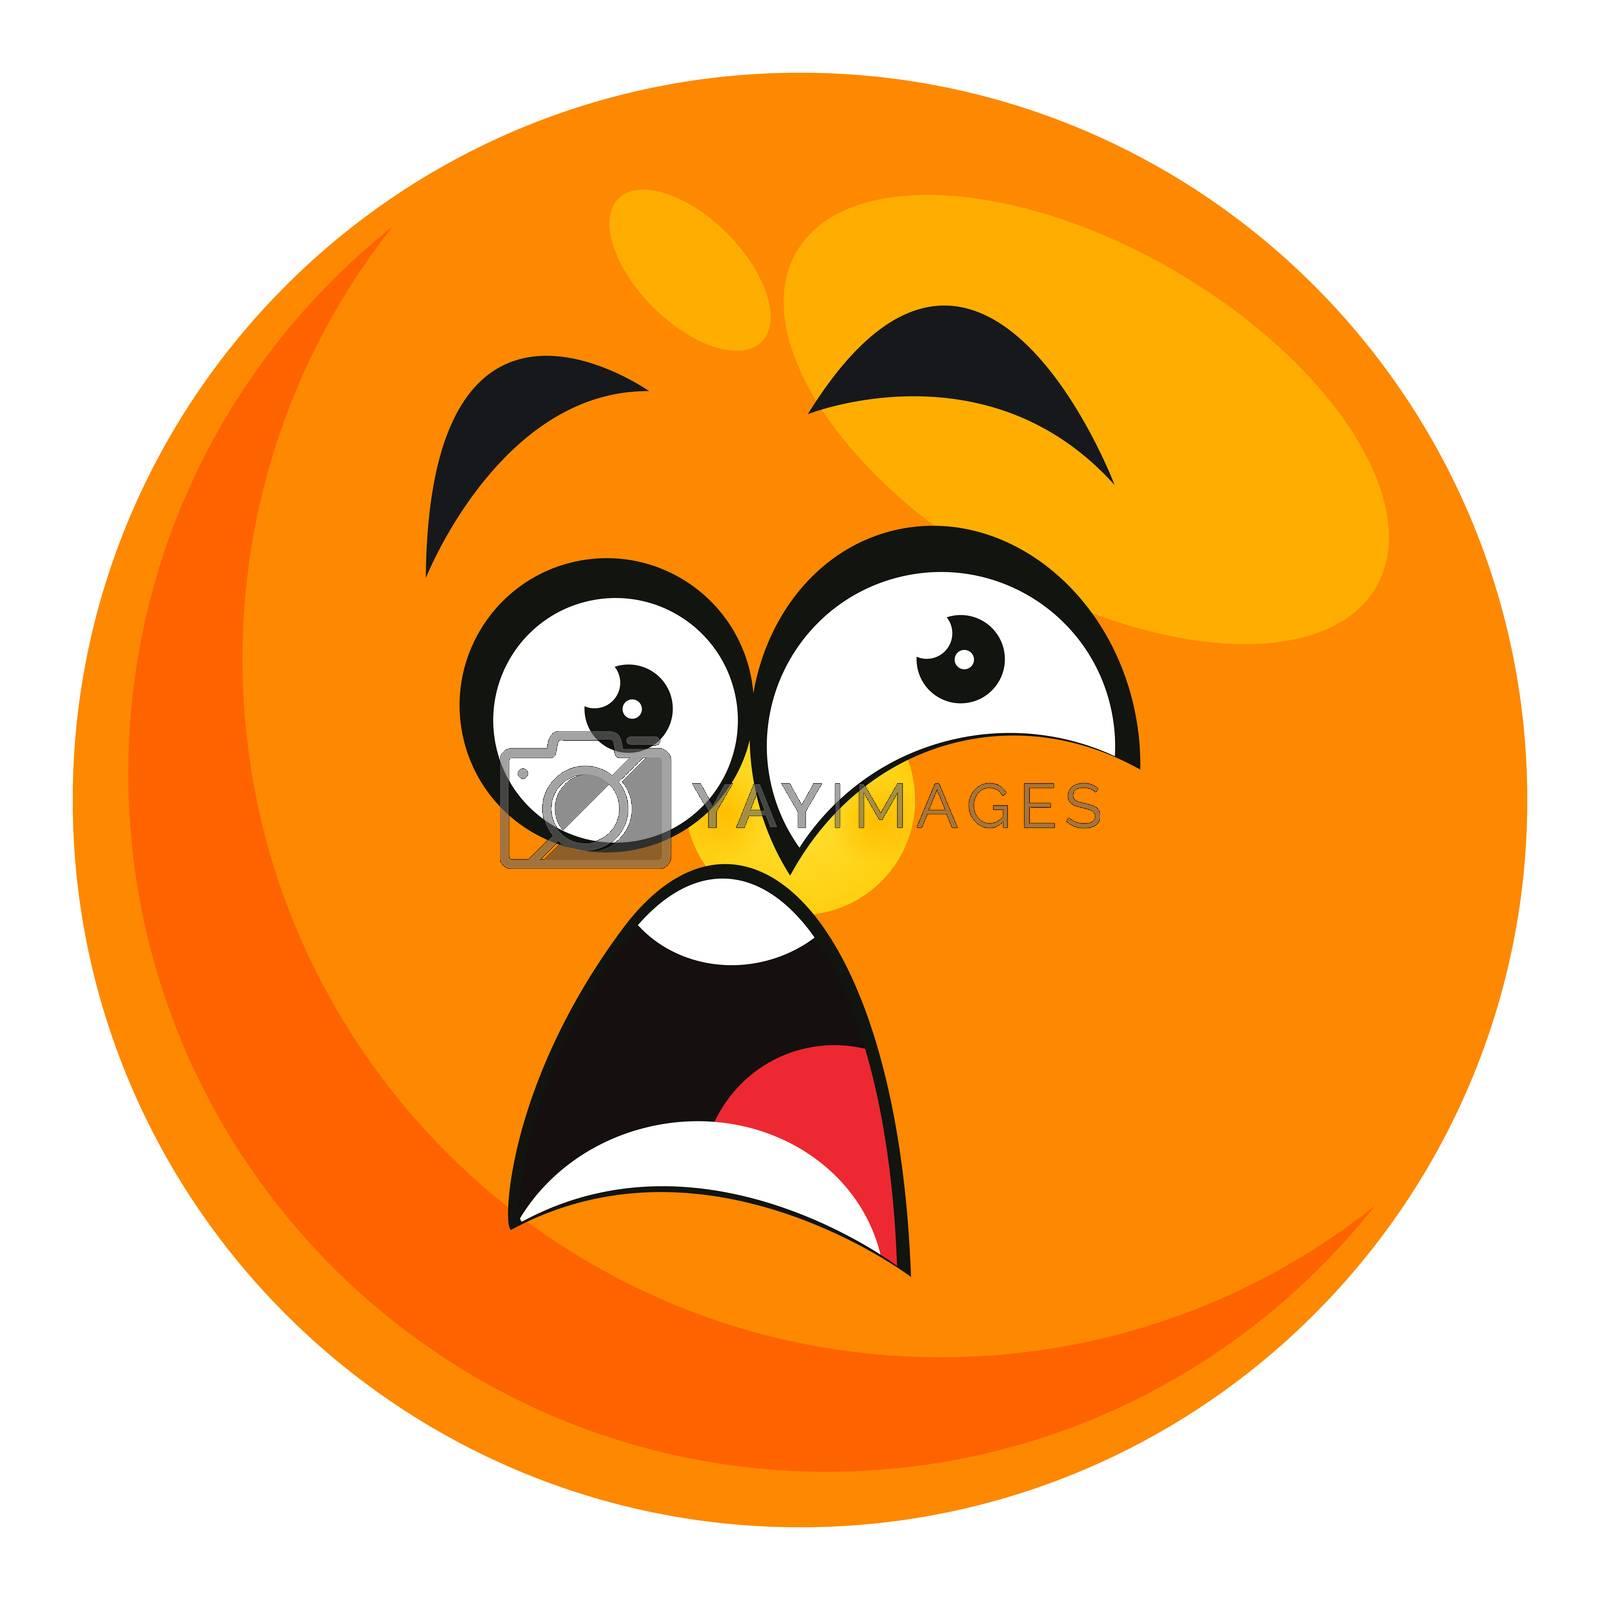 Shocked emoji, illustration, vector on white background